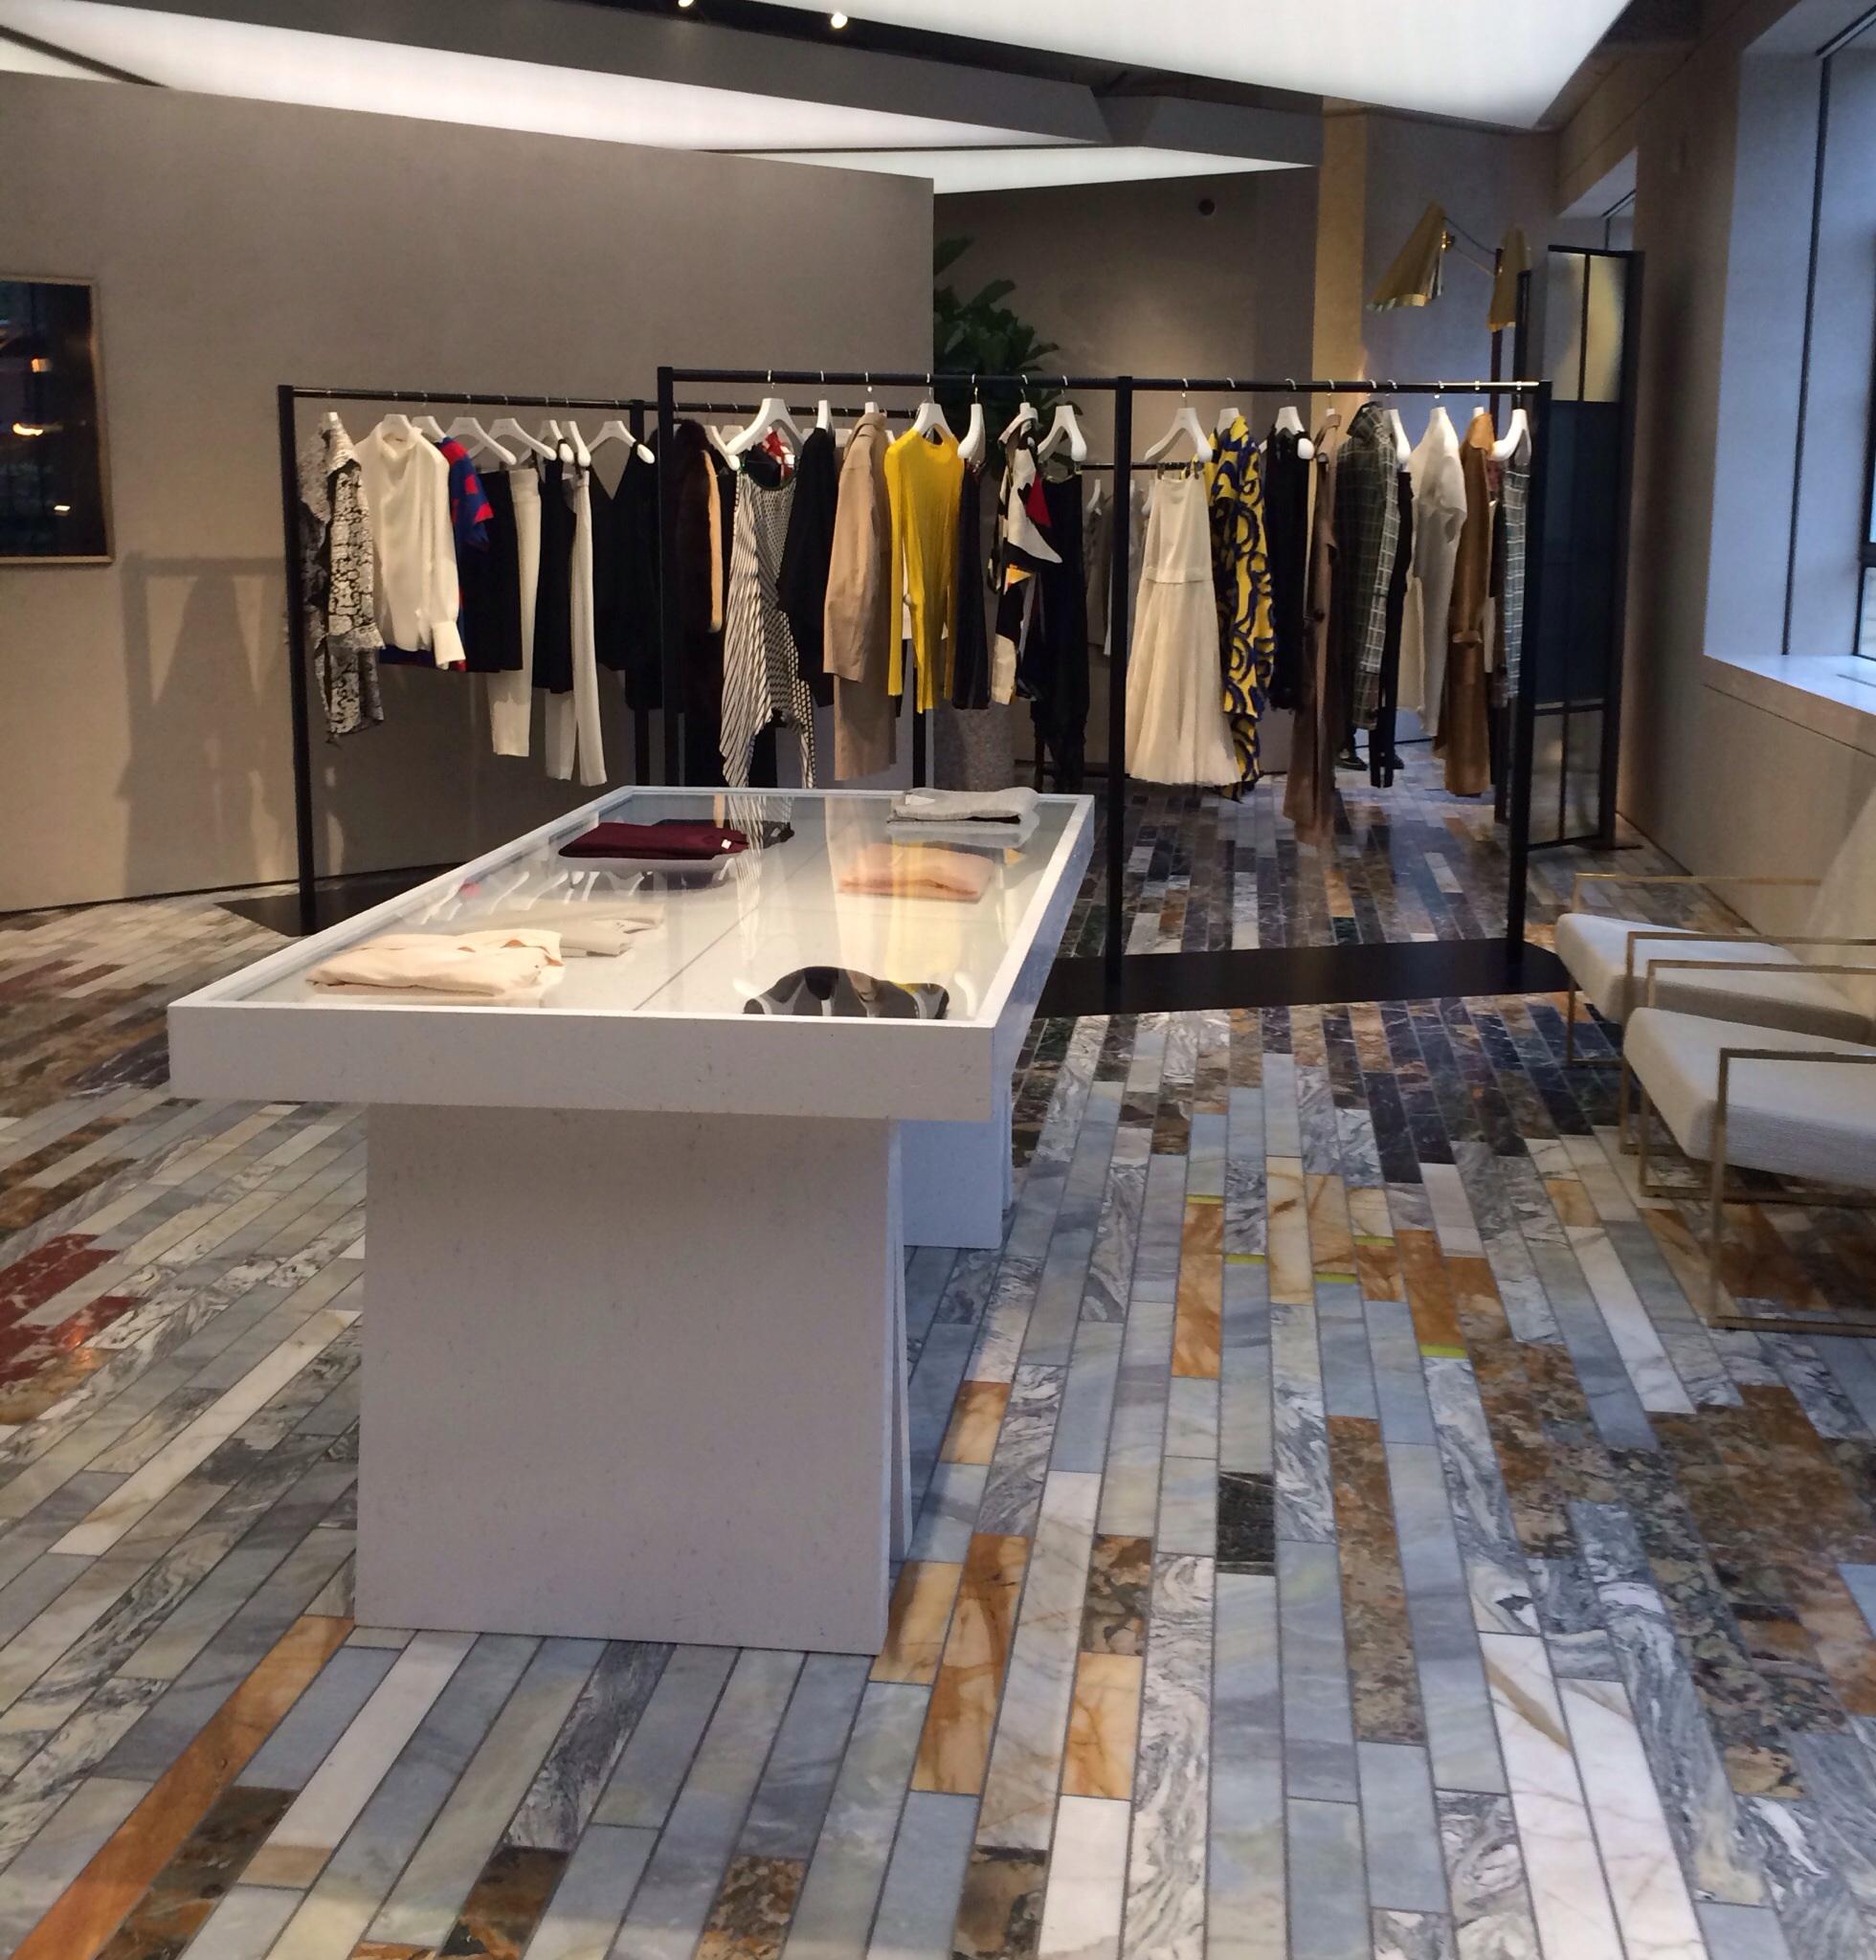 celine s new flagship store opens at mount street london worklondonstyle. Black Bedroom Furniture Sets. Home Design Ideas